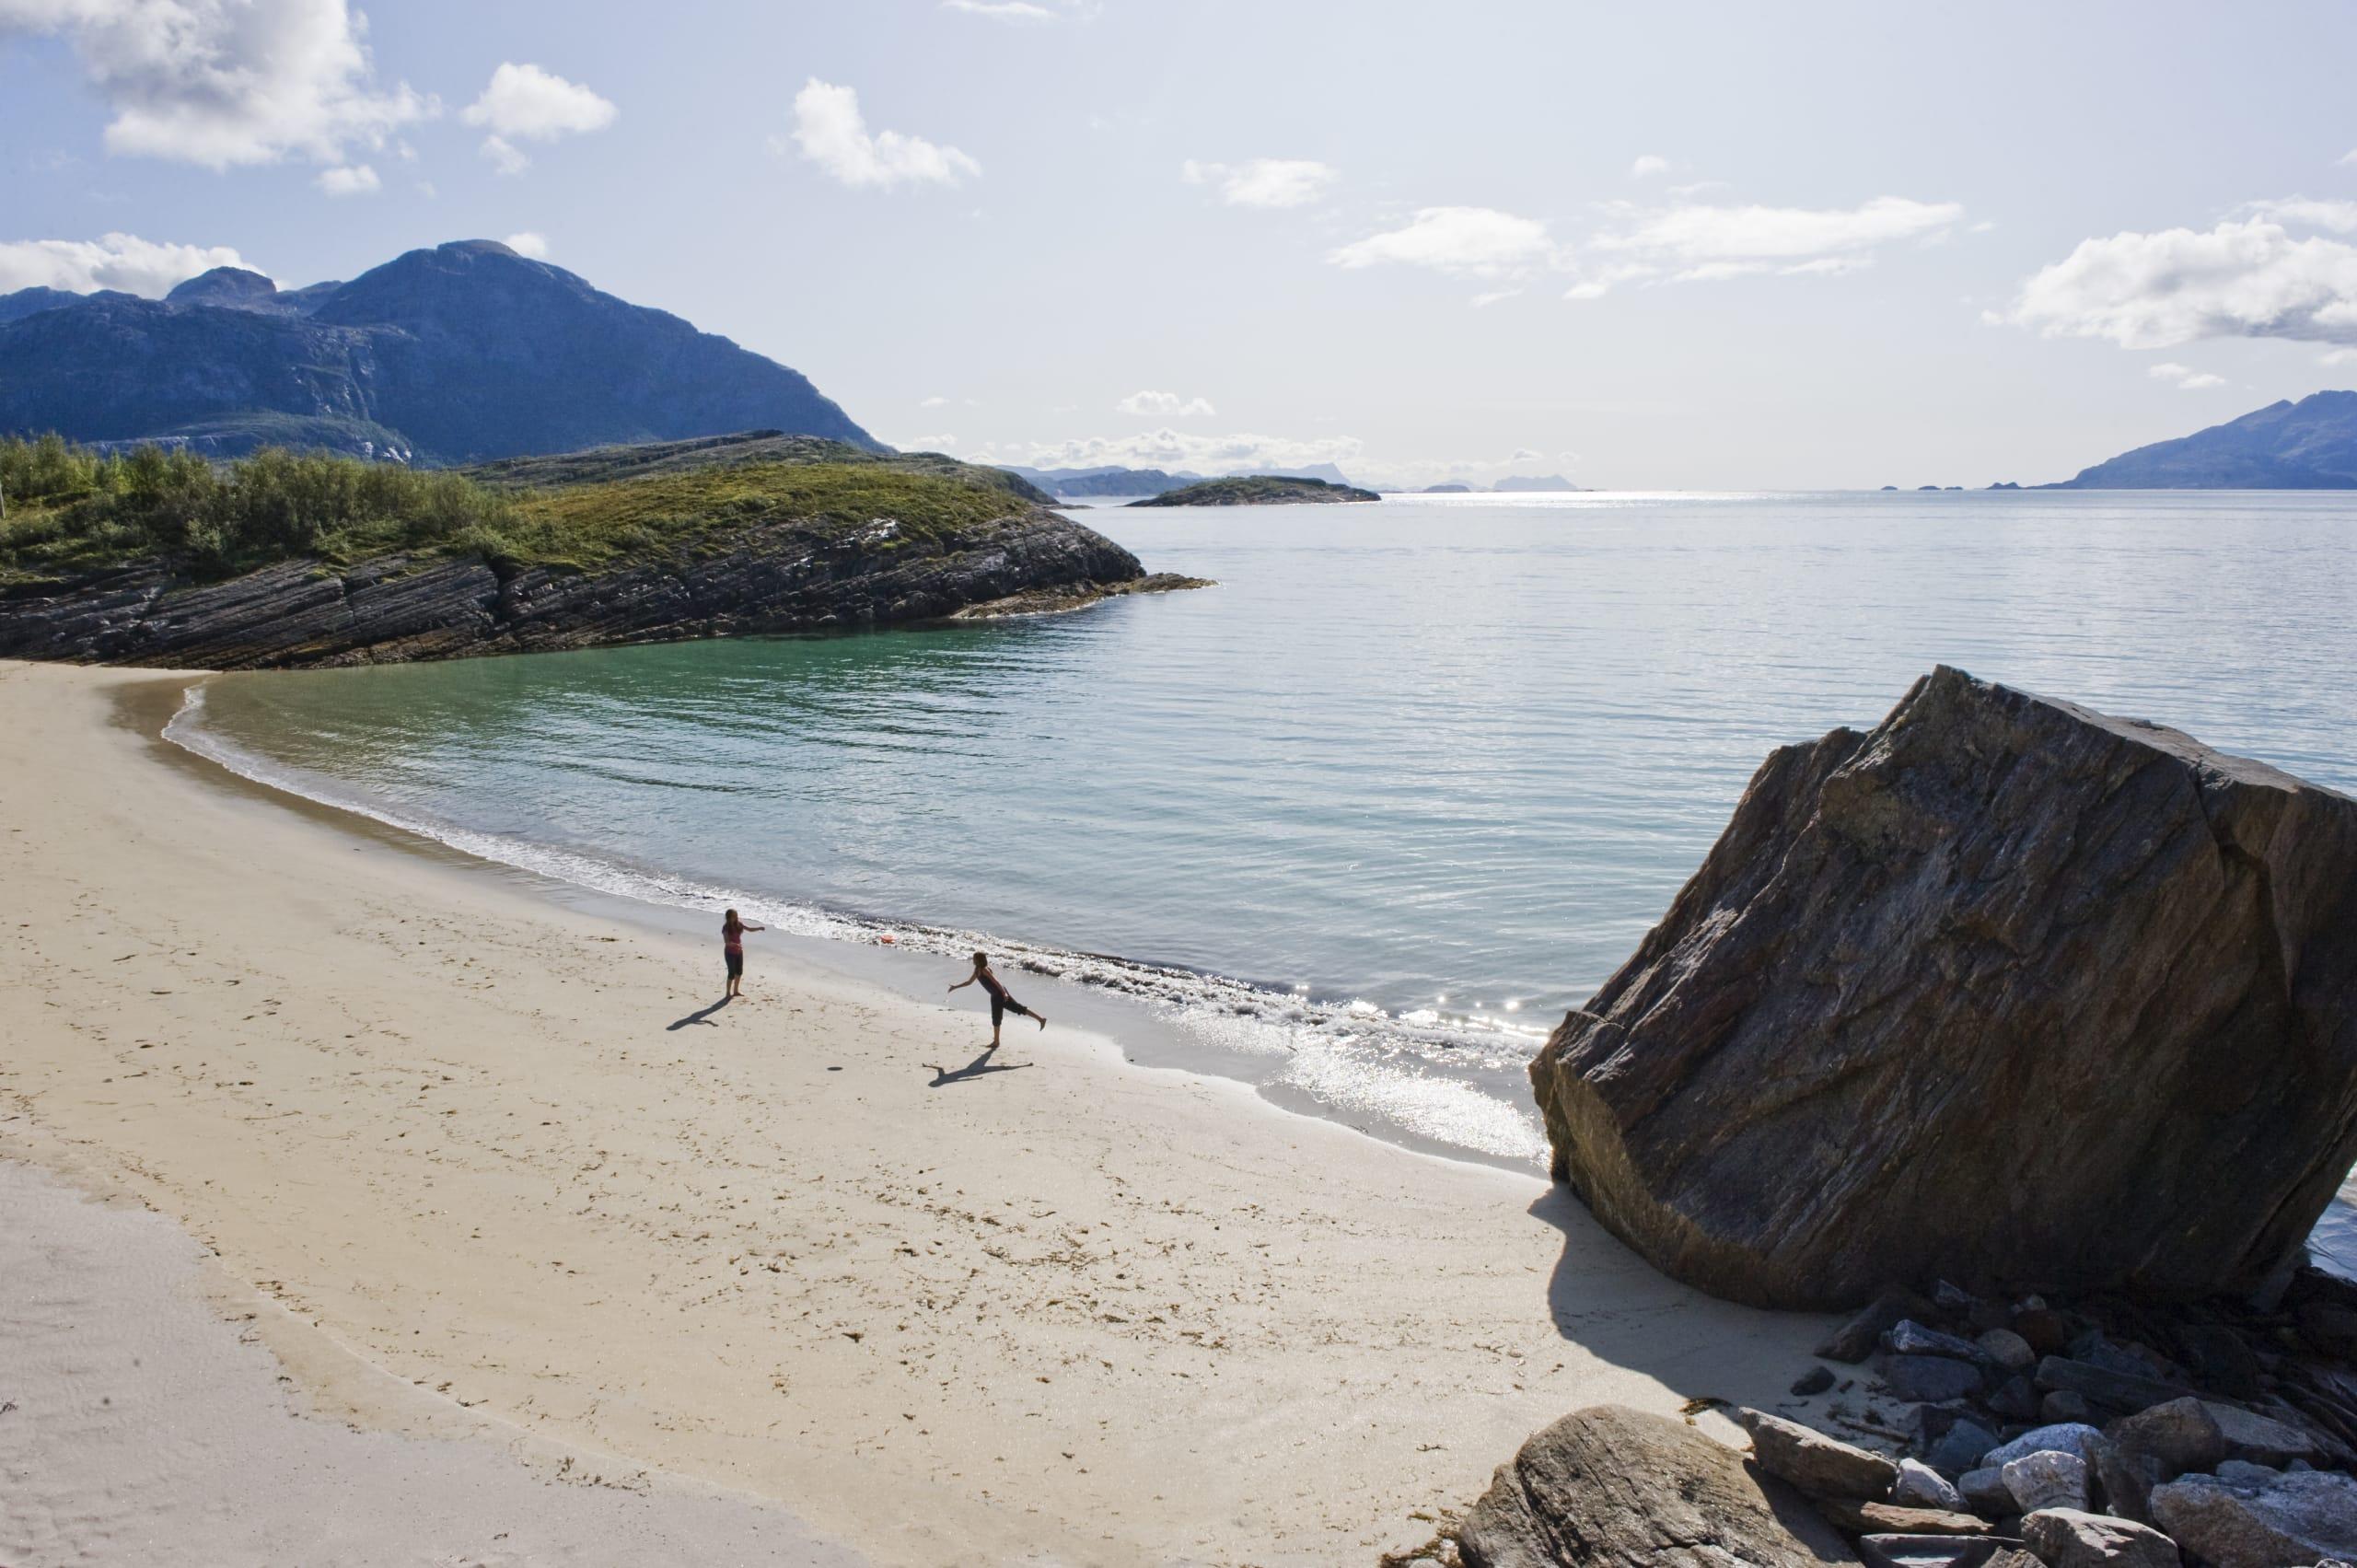 Paradisbukta beach close to the town of Bodø